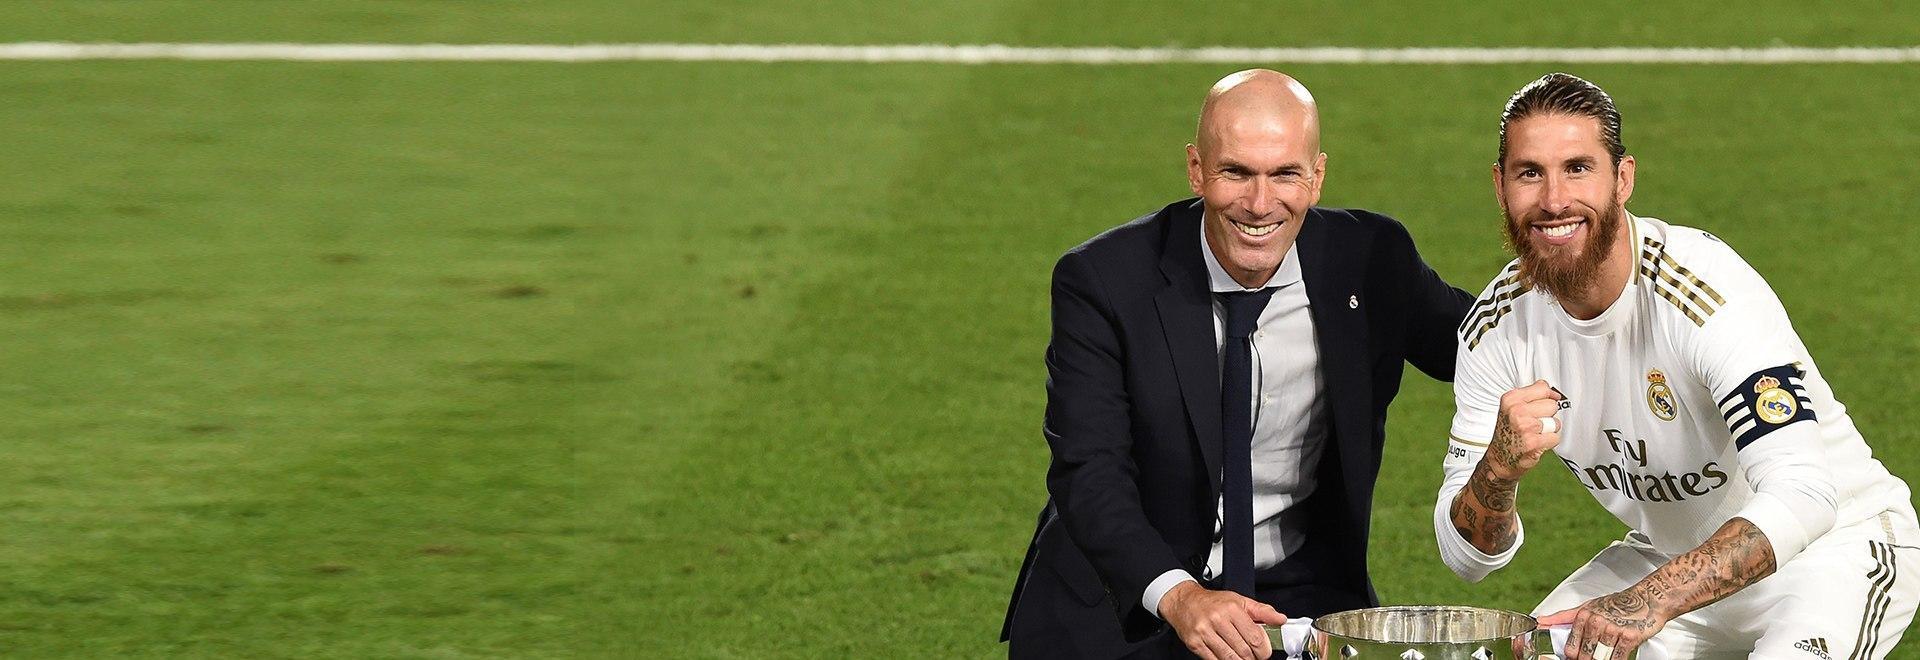 Zidane, la Liga più speciale